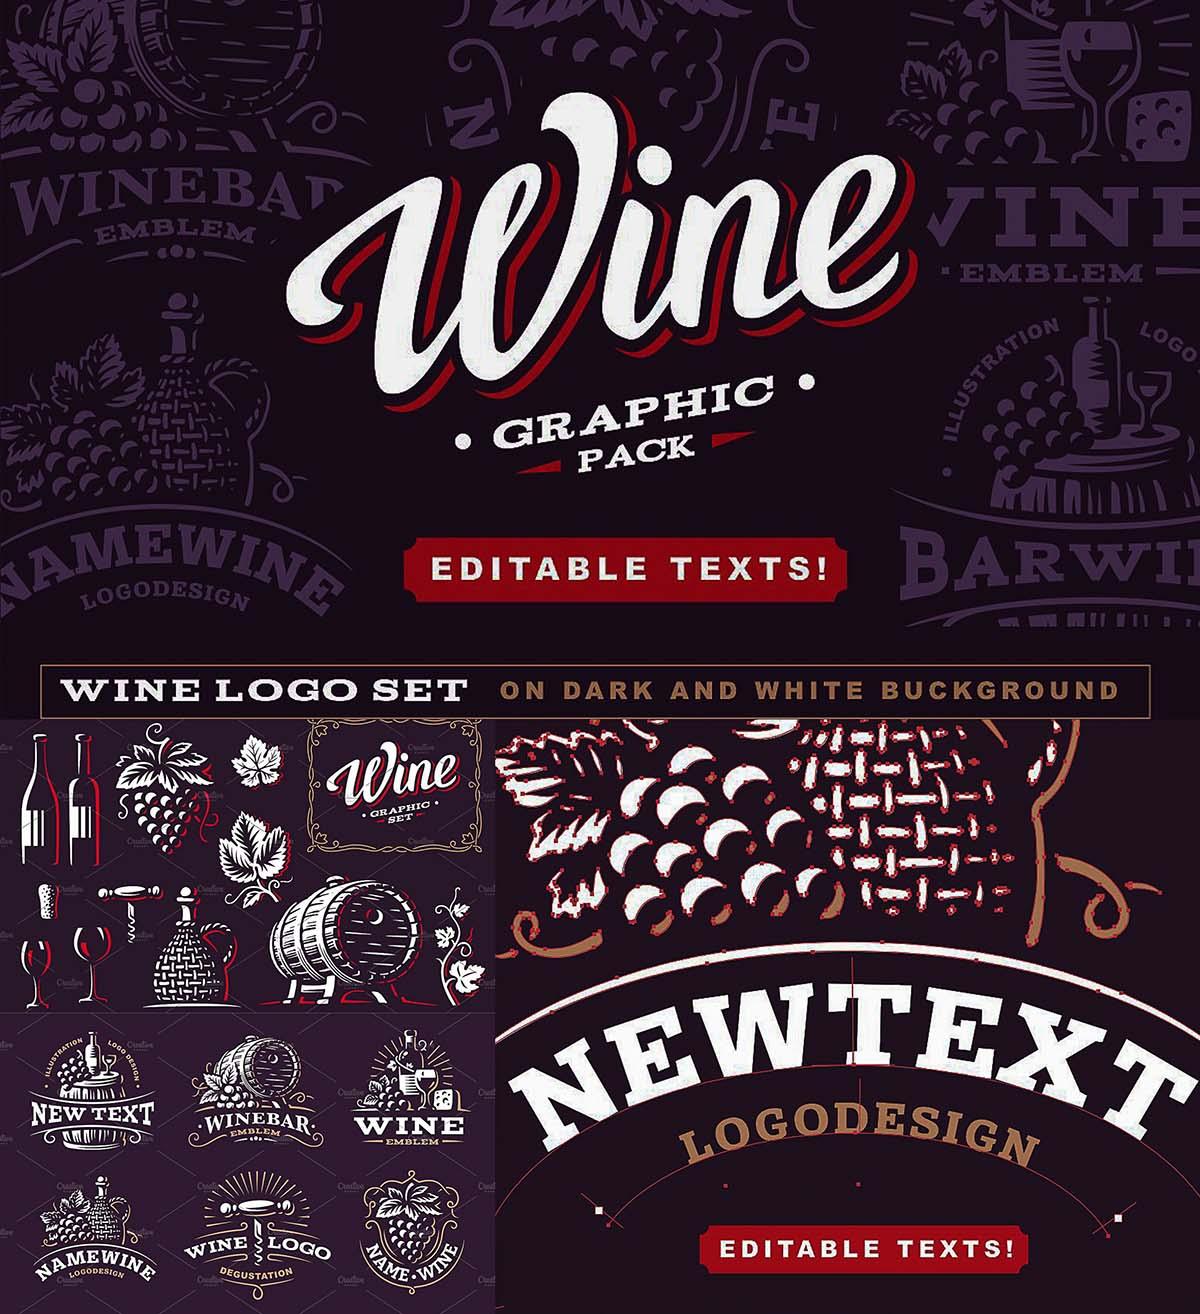 Wine vector logo pack